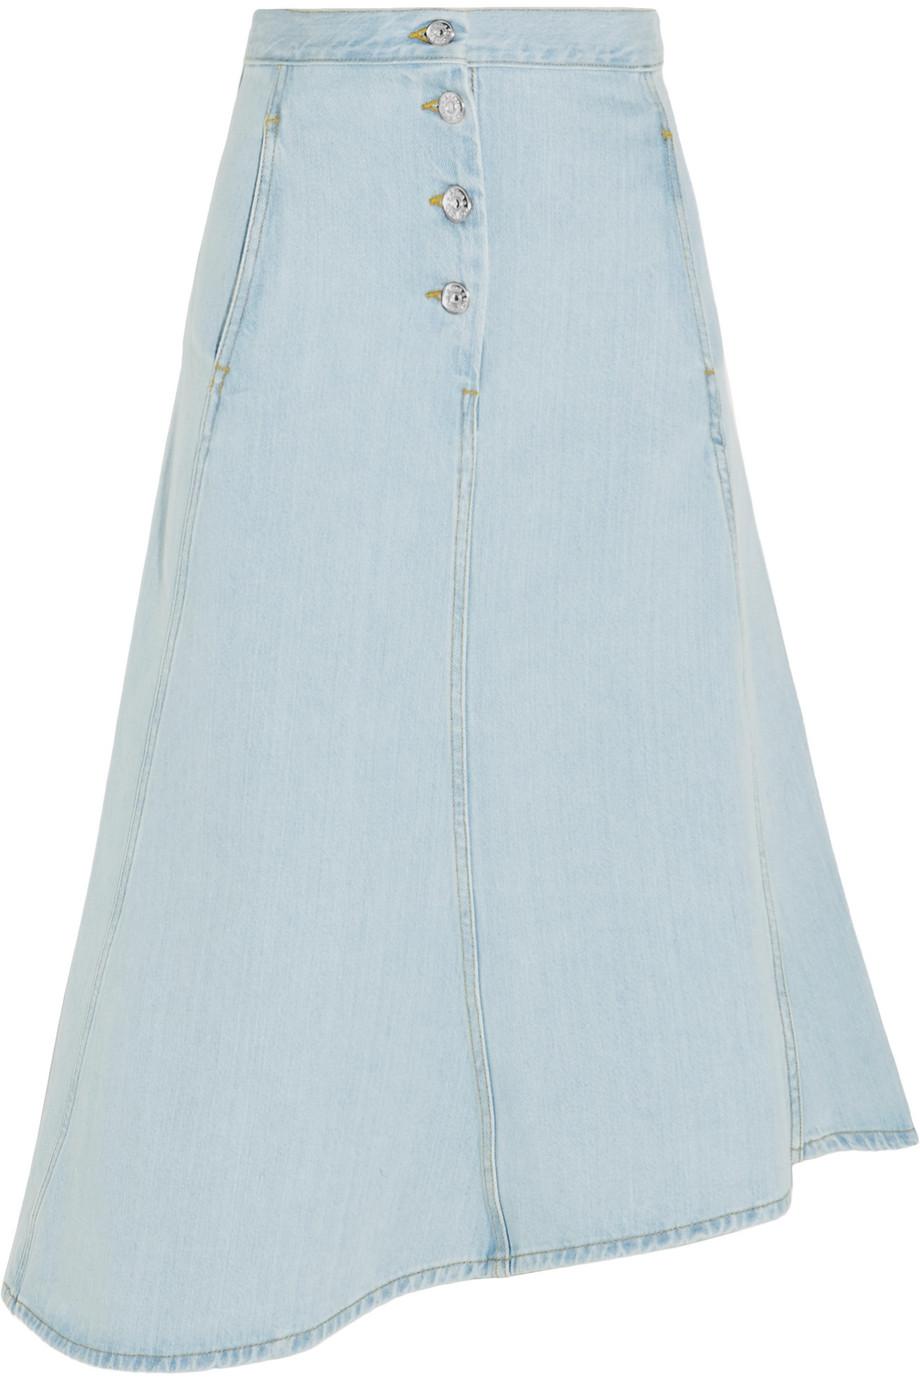 Acne Studios Kady Asymmetric Denim Midi Skirt, Light Denim, Women's, Size: 38